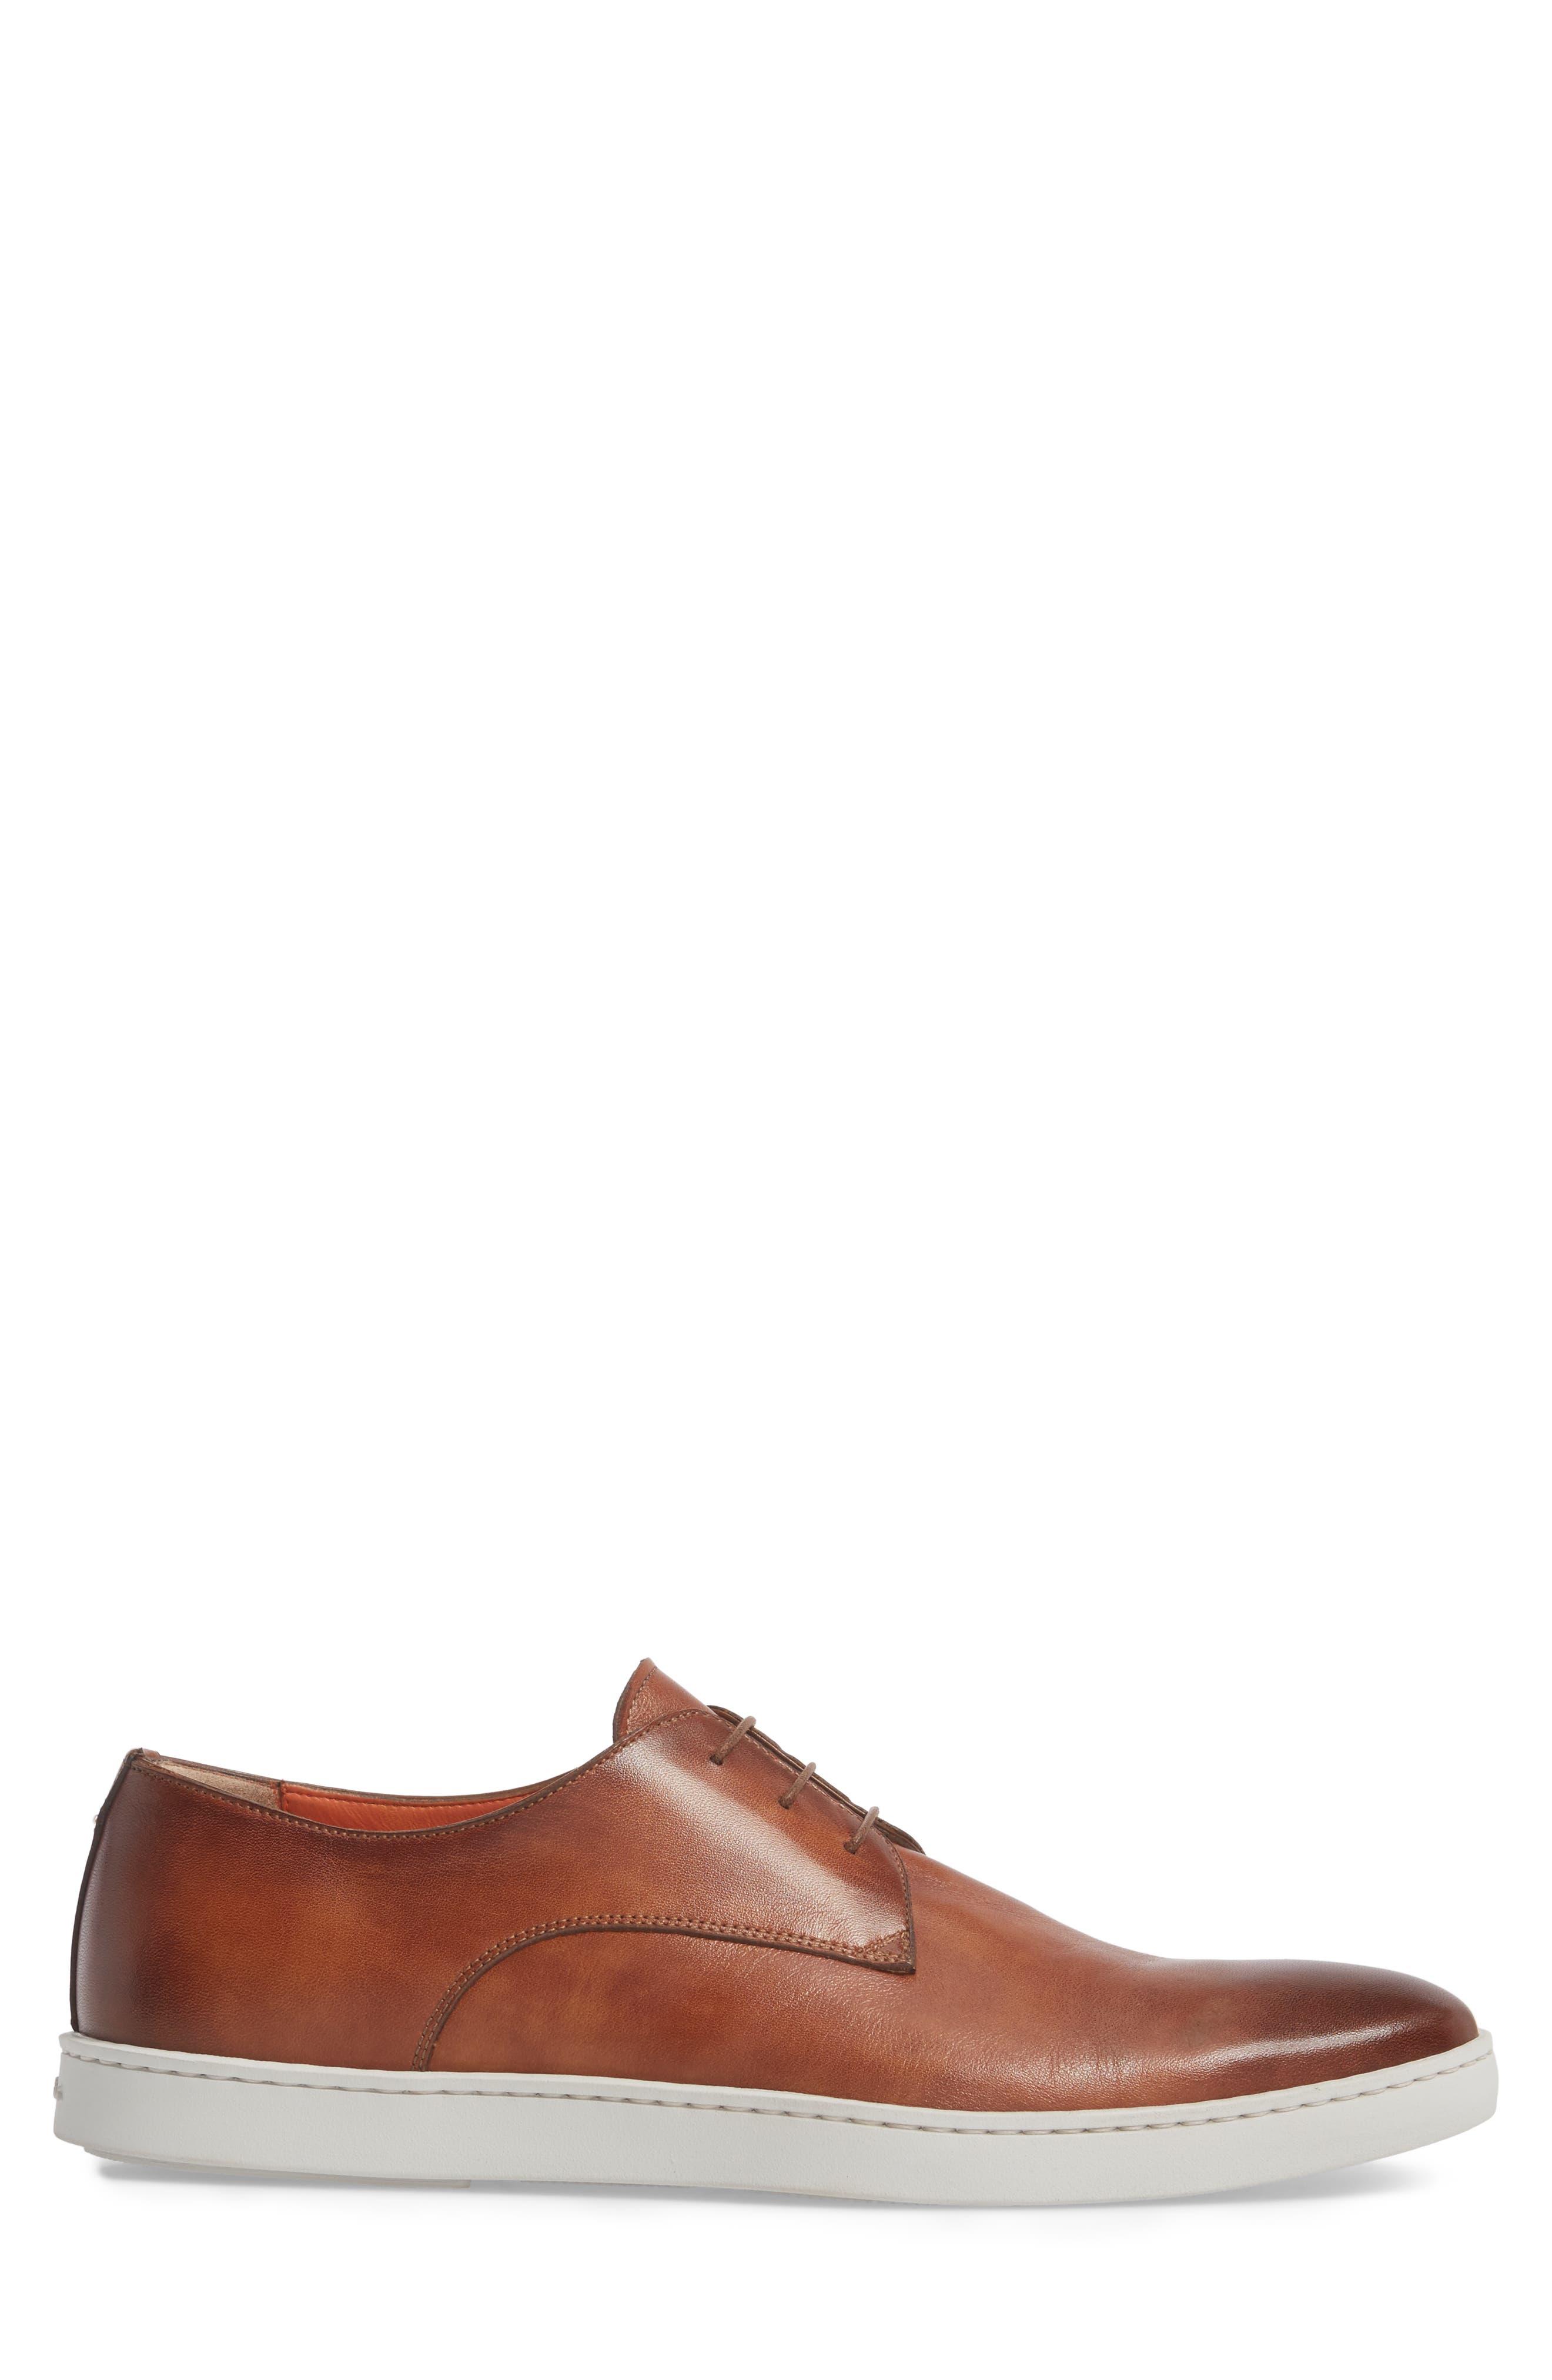 Doyle Plain Toe Derby Sneaker,                             Alternate thumbnail 3, color,                             TAN